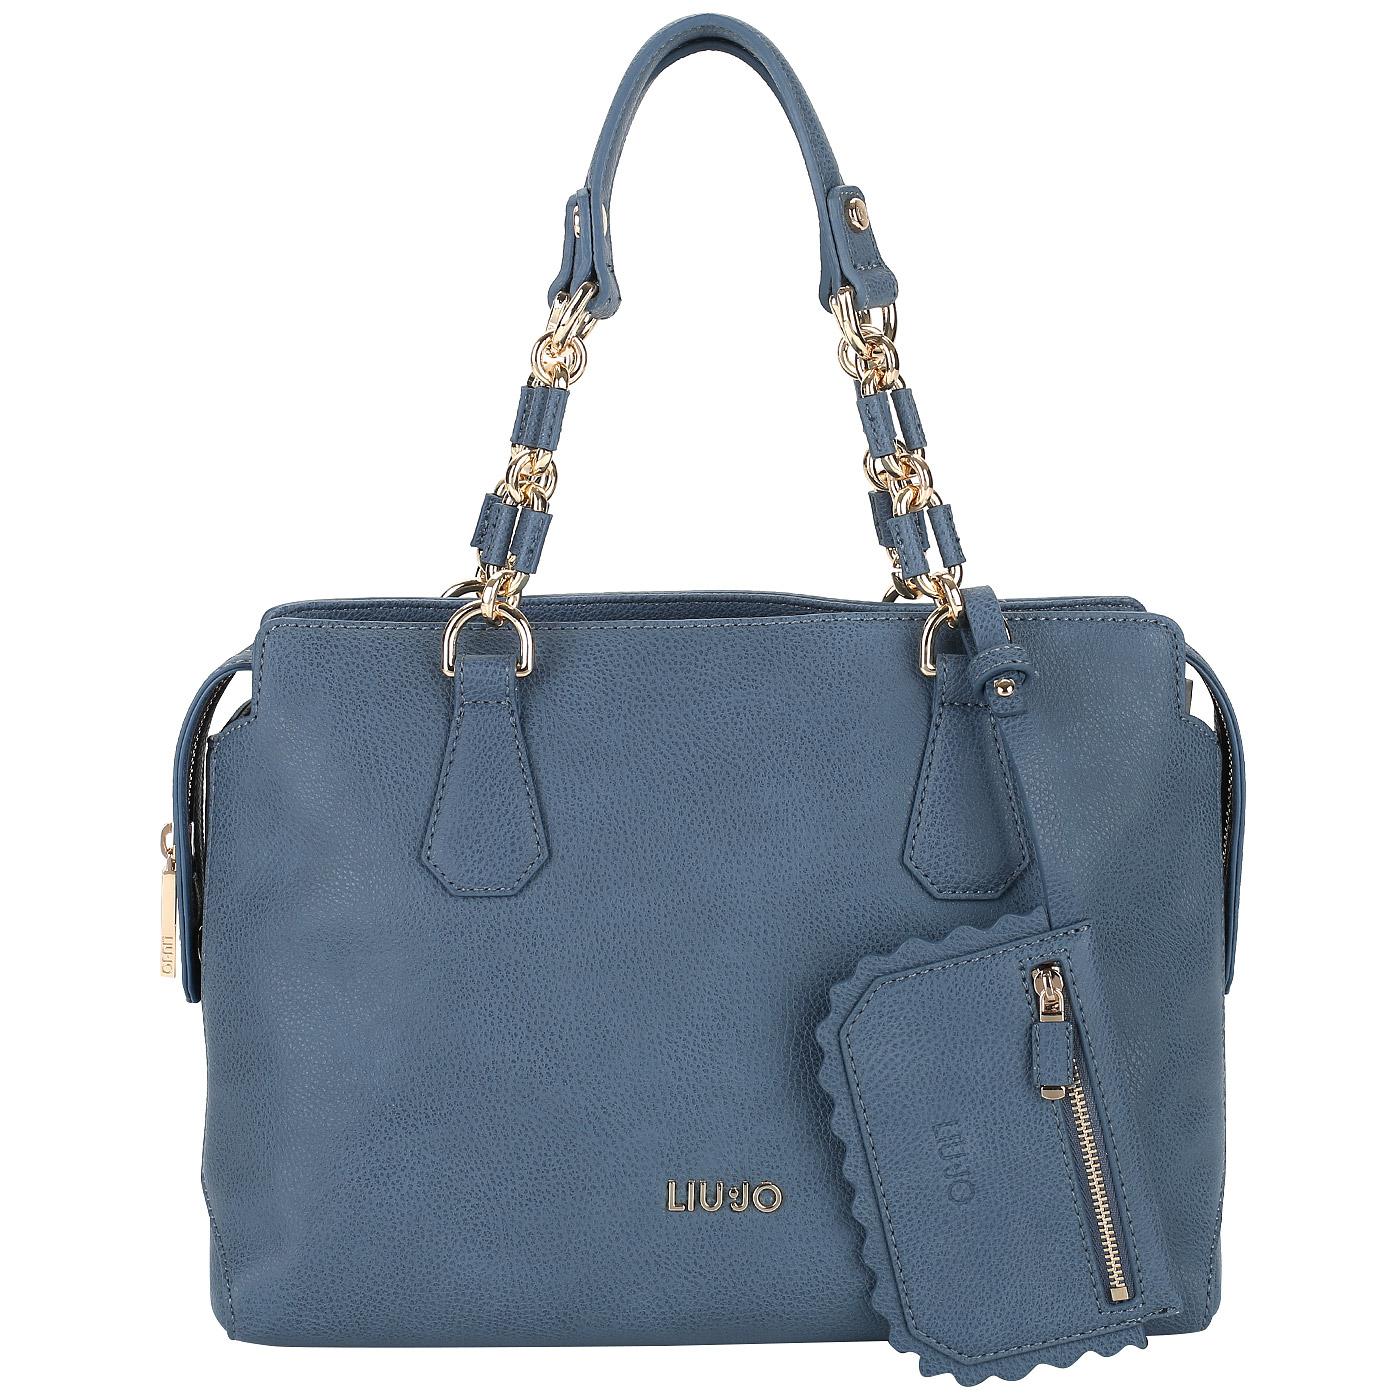 a2a3ea7abfea Женская сумка со съемным кармашком Liu Jo Detroit A18002E0027_blu ...